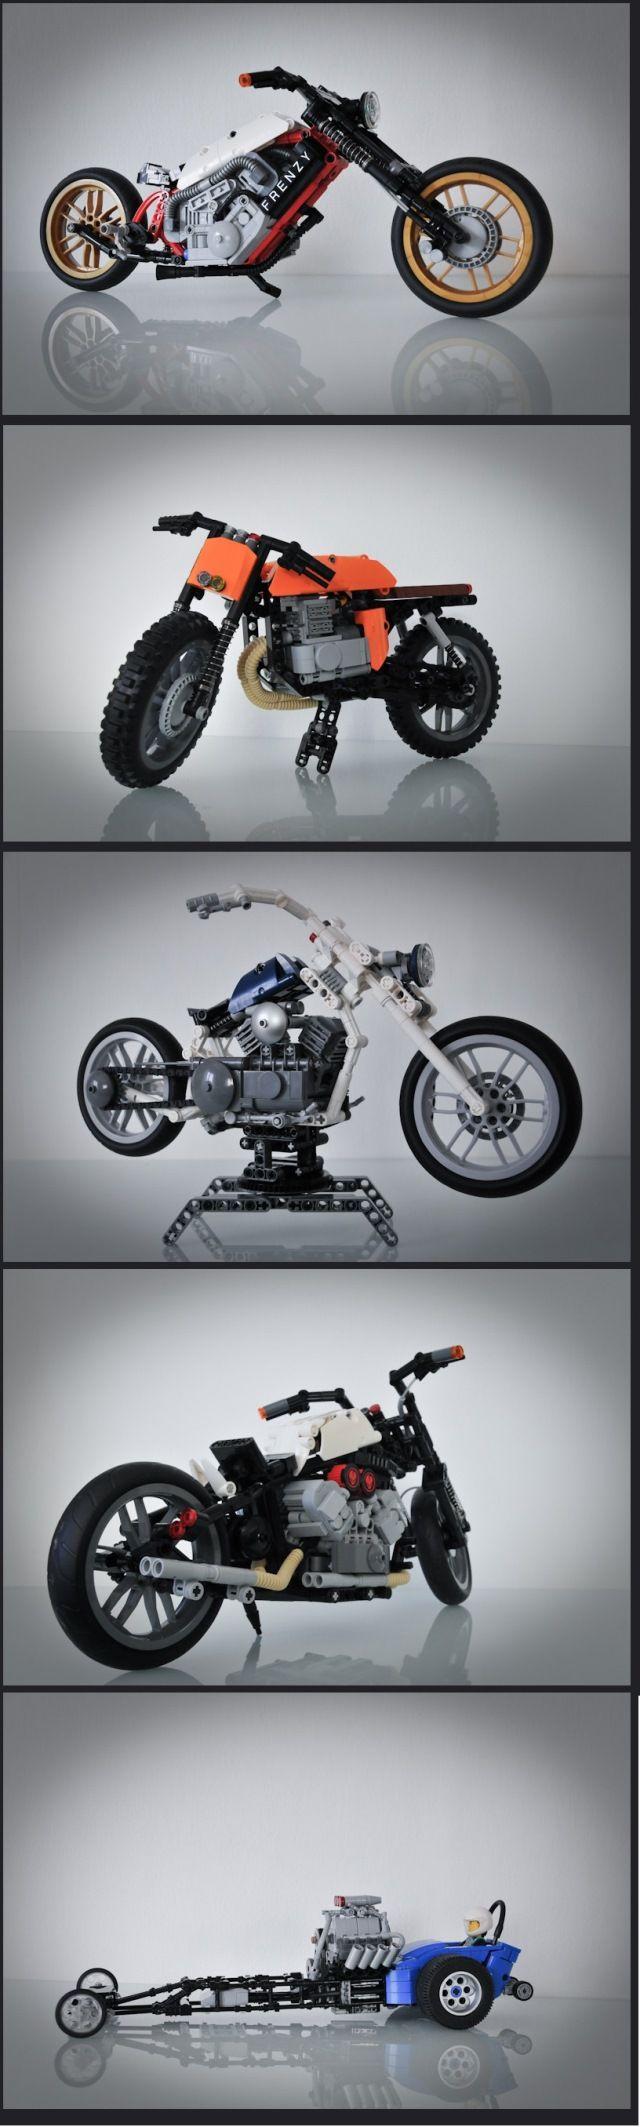 motorbikes lego stephan jonsson 4h10.com